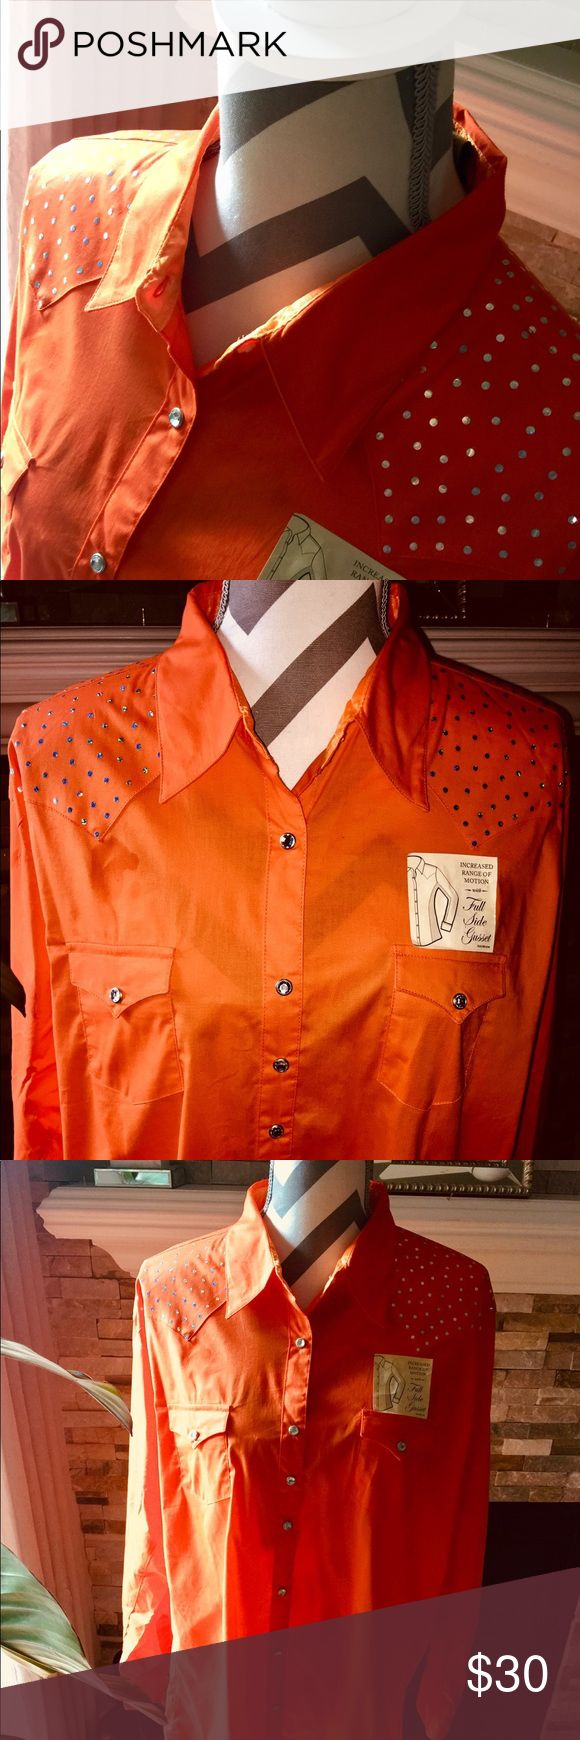 Wrangler Women's Rhinestone Snap Western Shirt Wrangler® Women's Solid Orange with Rhinestone Snaps Long Sleeve Ultimate Riding Western Shirt   Cavender's. Size 3XL NWOT Wrangler Tops Button Down Shirts